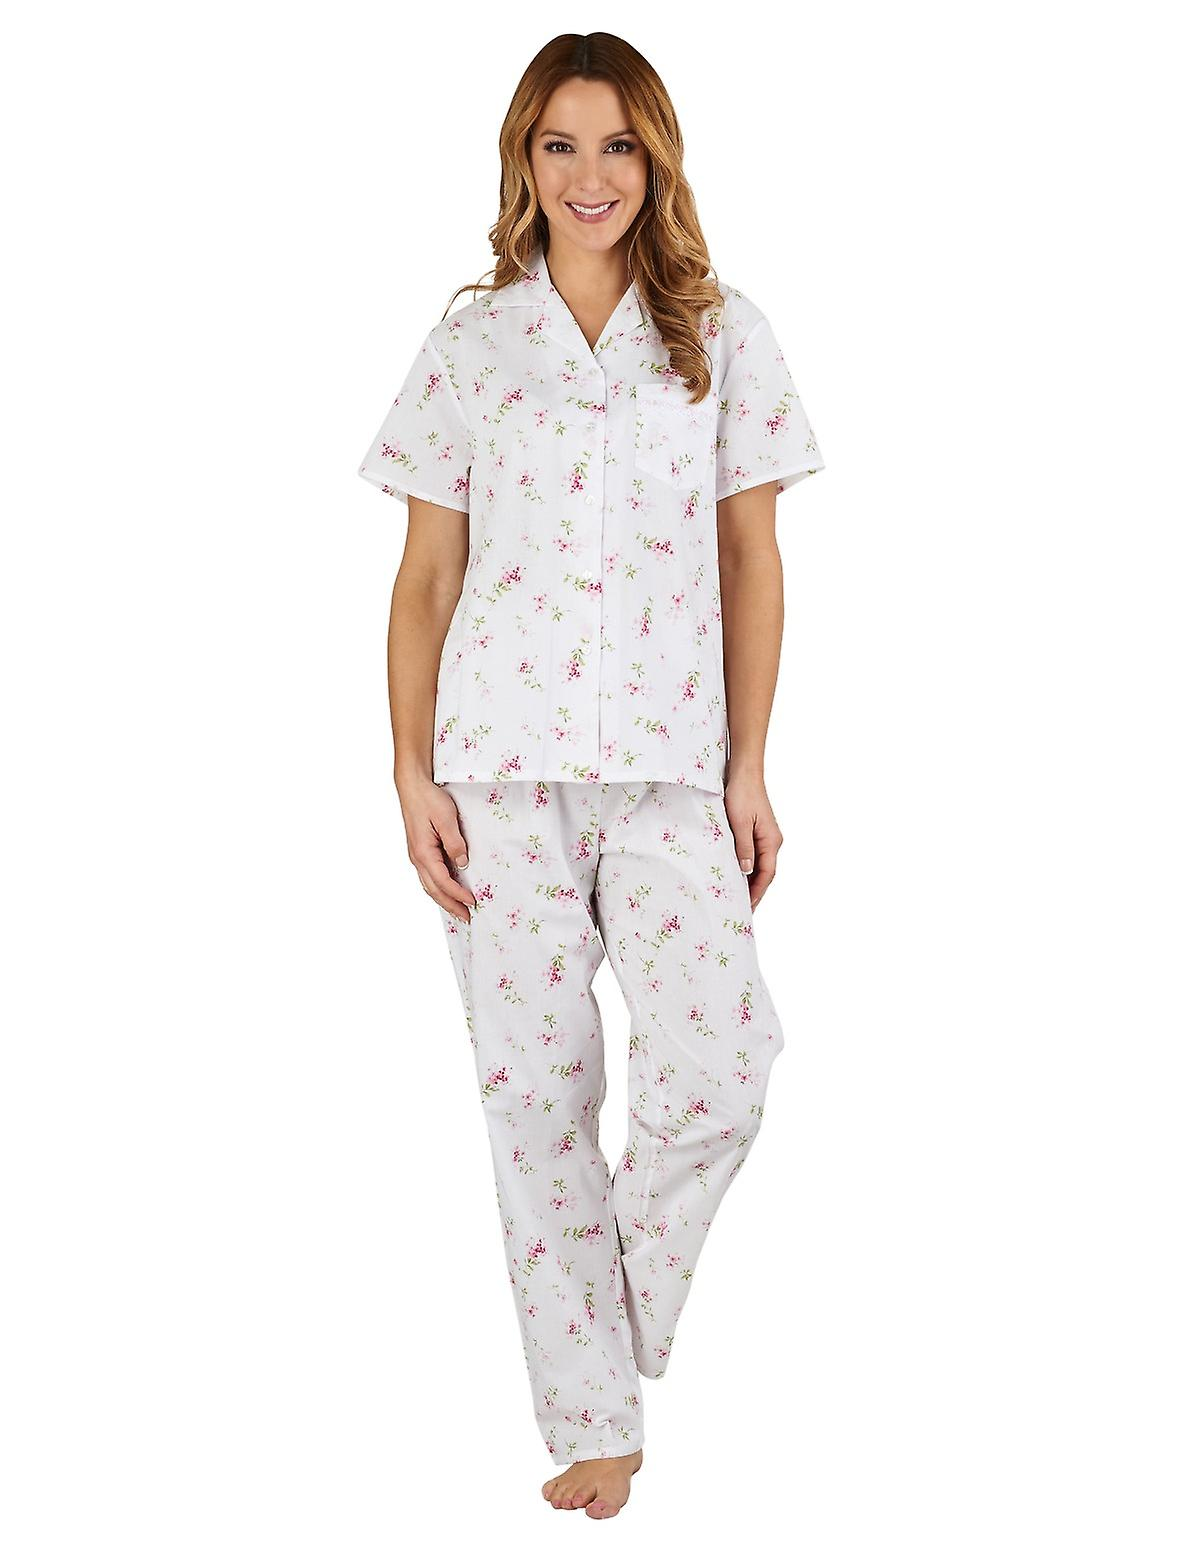 Slenderella PJ1207 Women's Floral Pink 100% Cotton Pajama Short Sleeved Pyjama Set